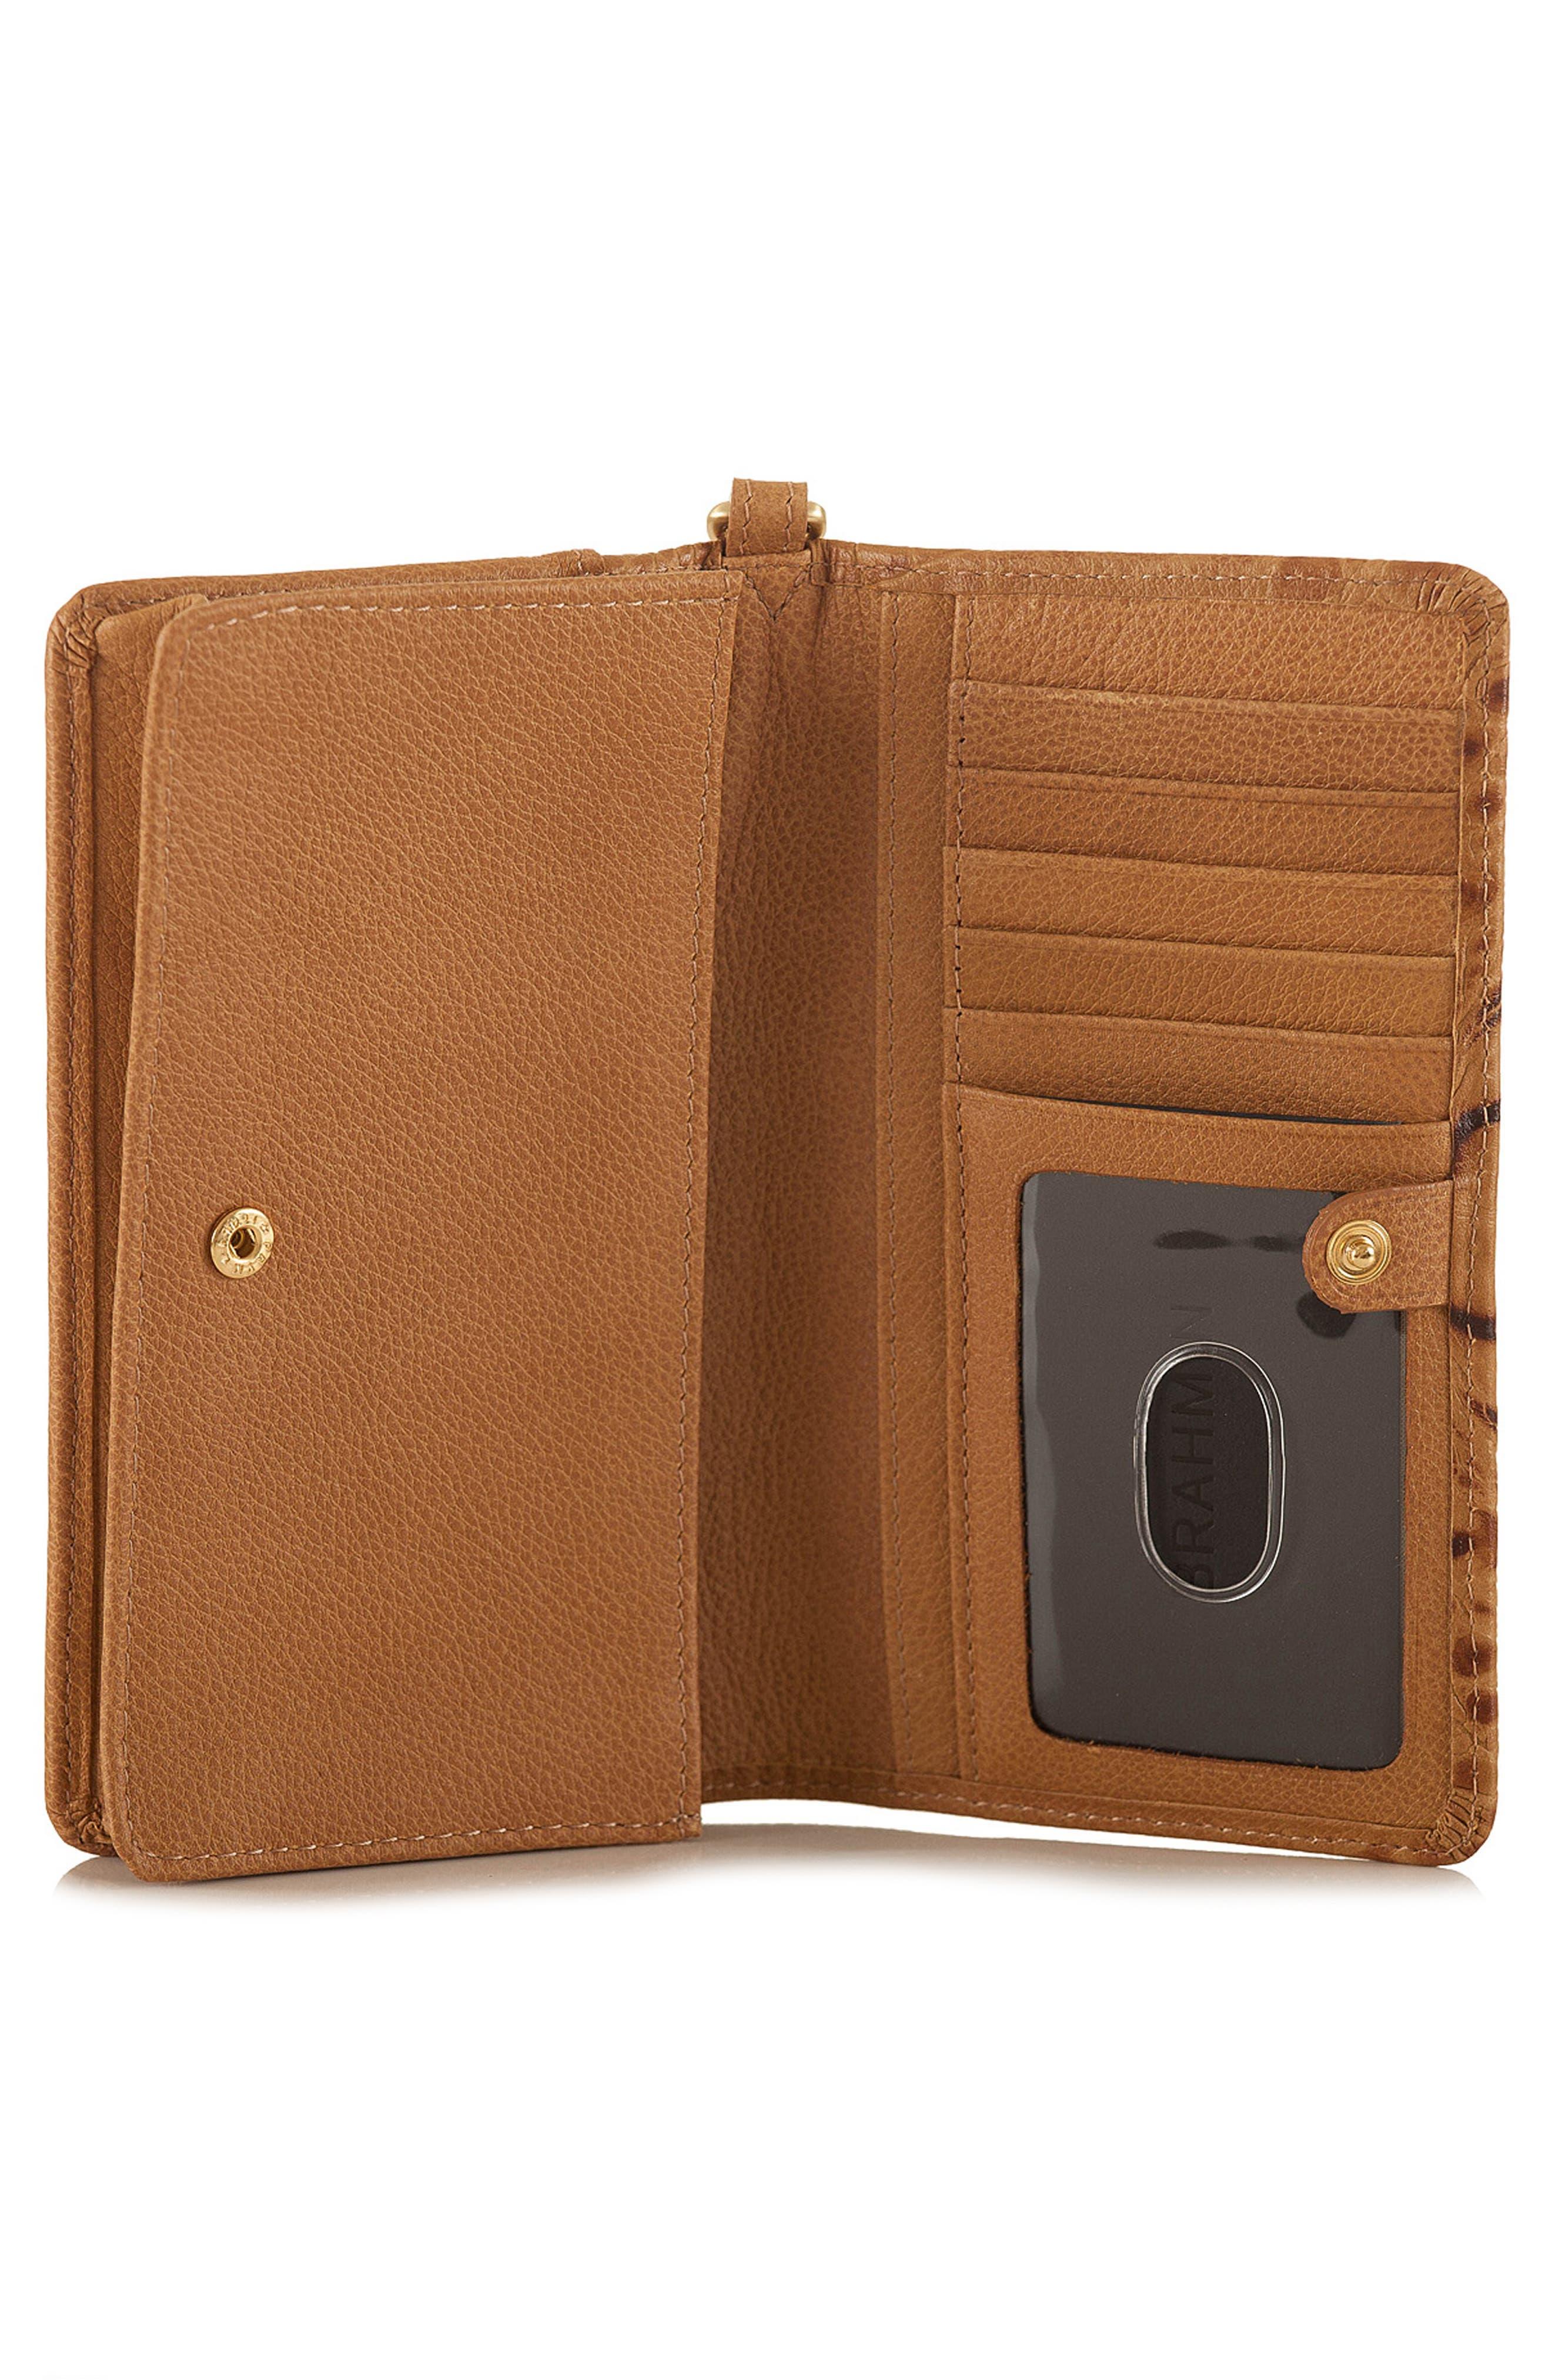 Debra Croc Embossed Leather Phone Wallet,                             Alternate thumbnail 2, color,                             205